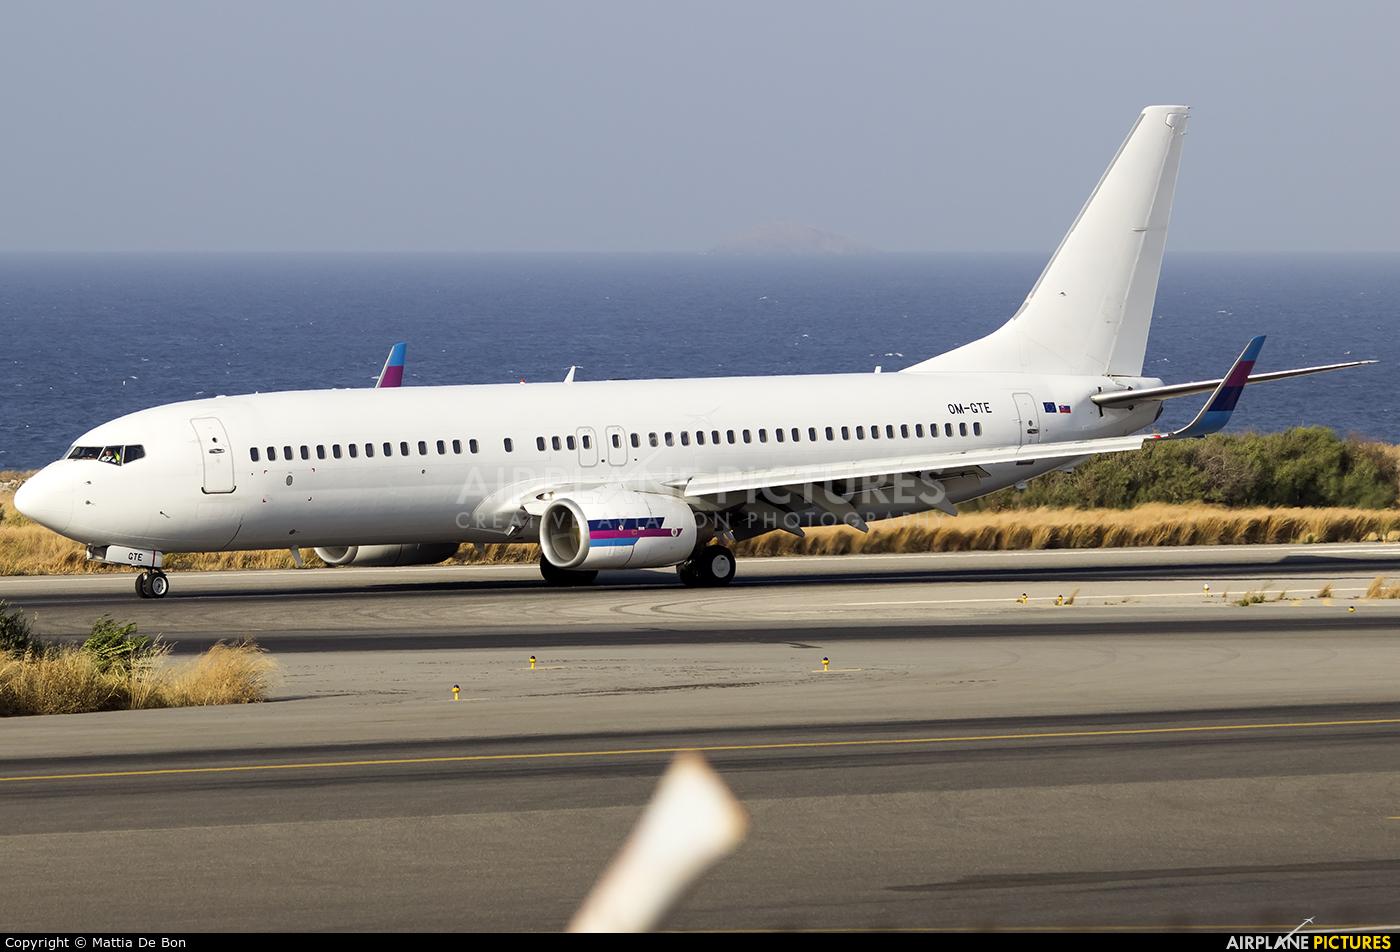 Go2Sky Airline OM-GTE aircraft at Heraklion - Nikos Kazantzakis